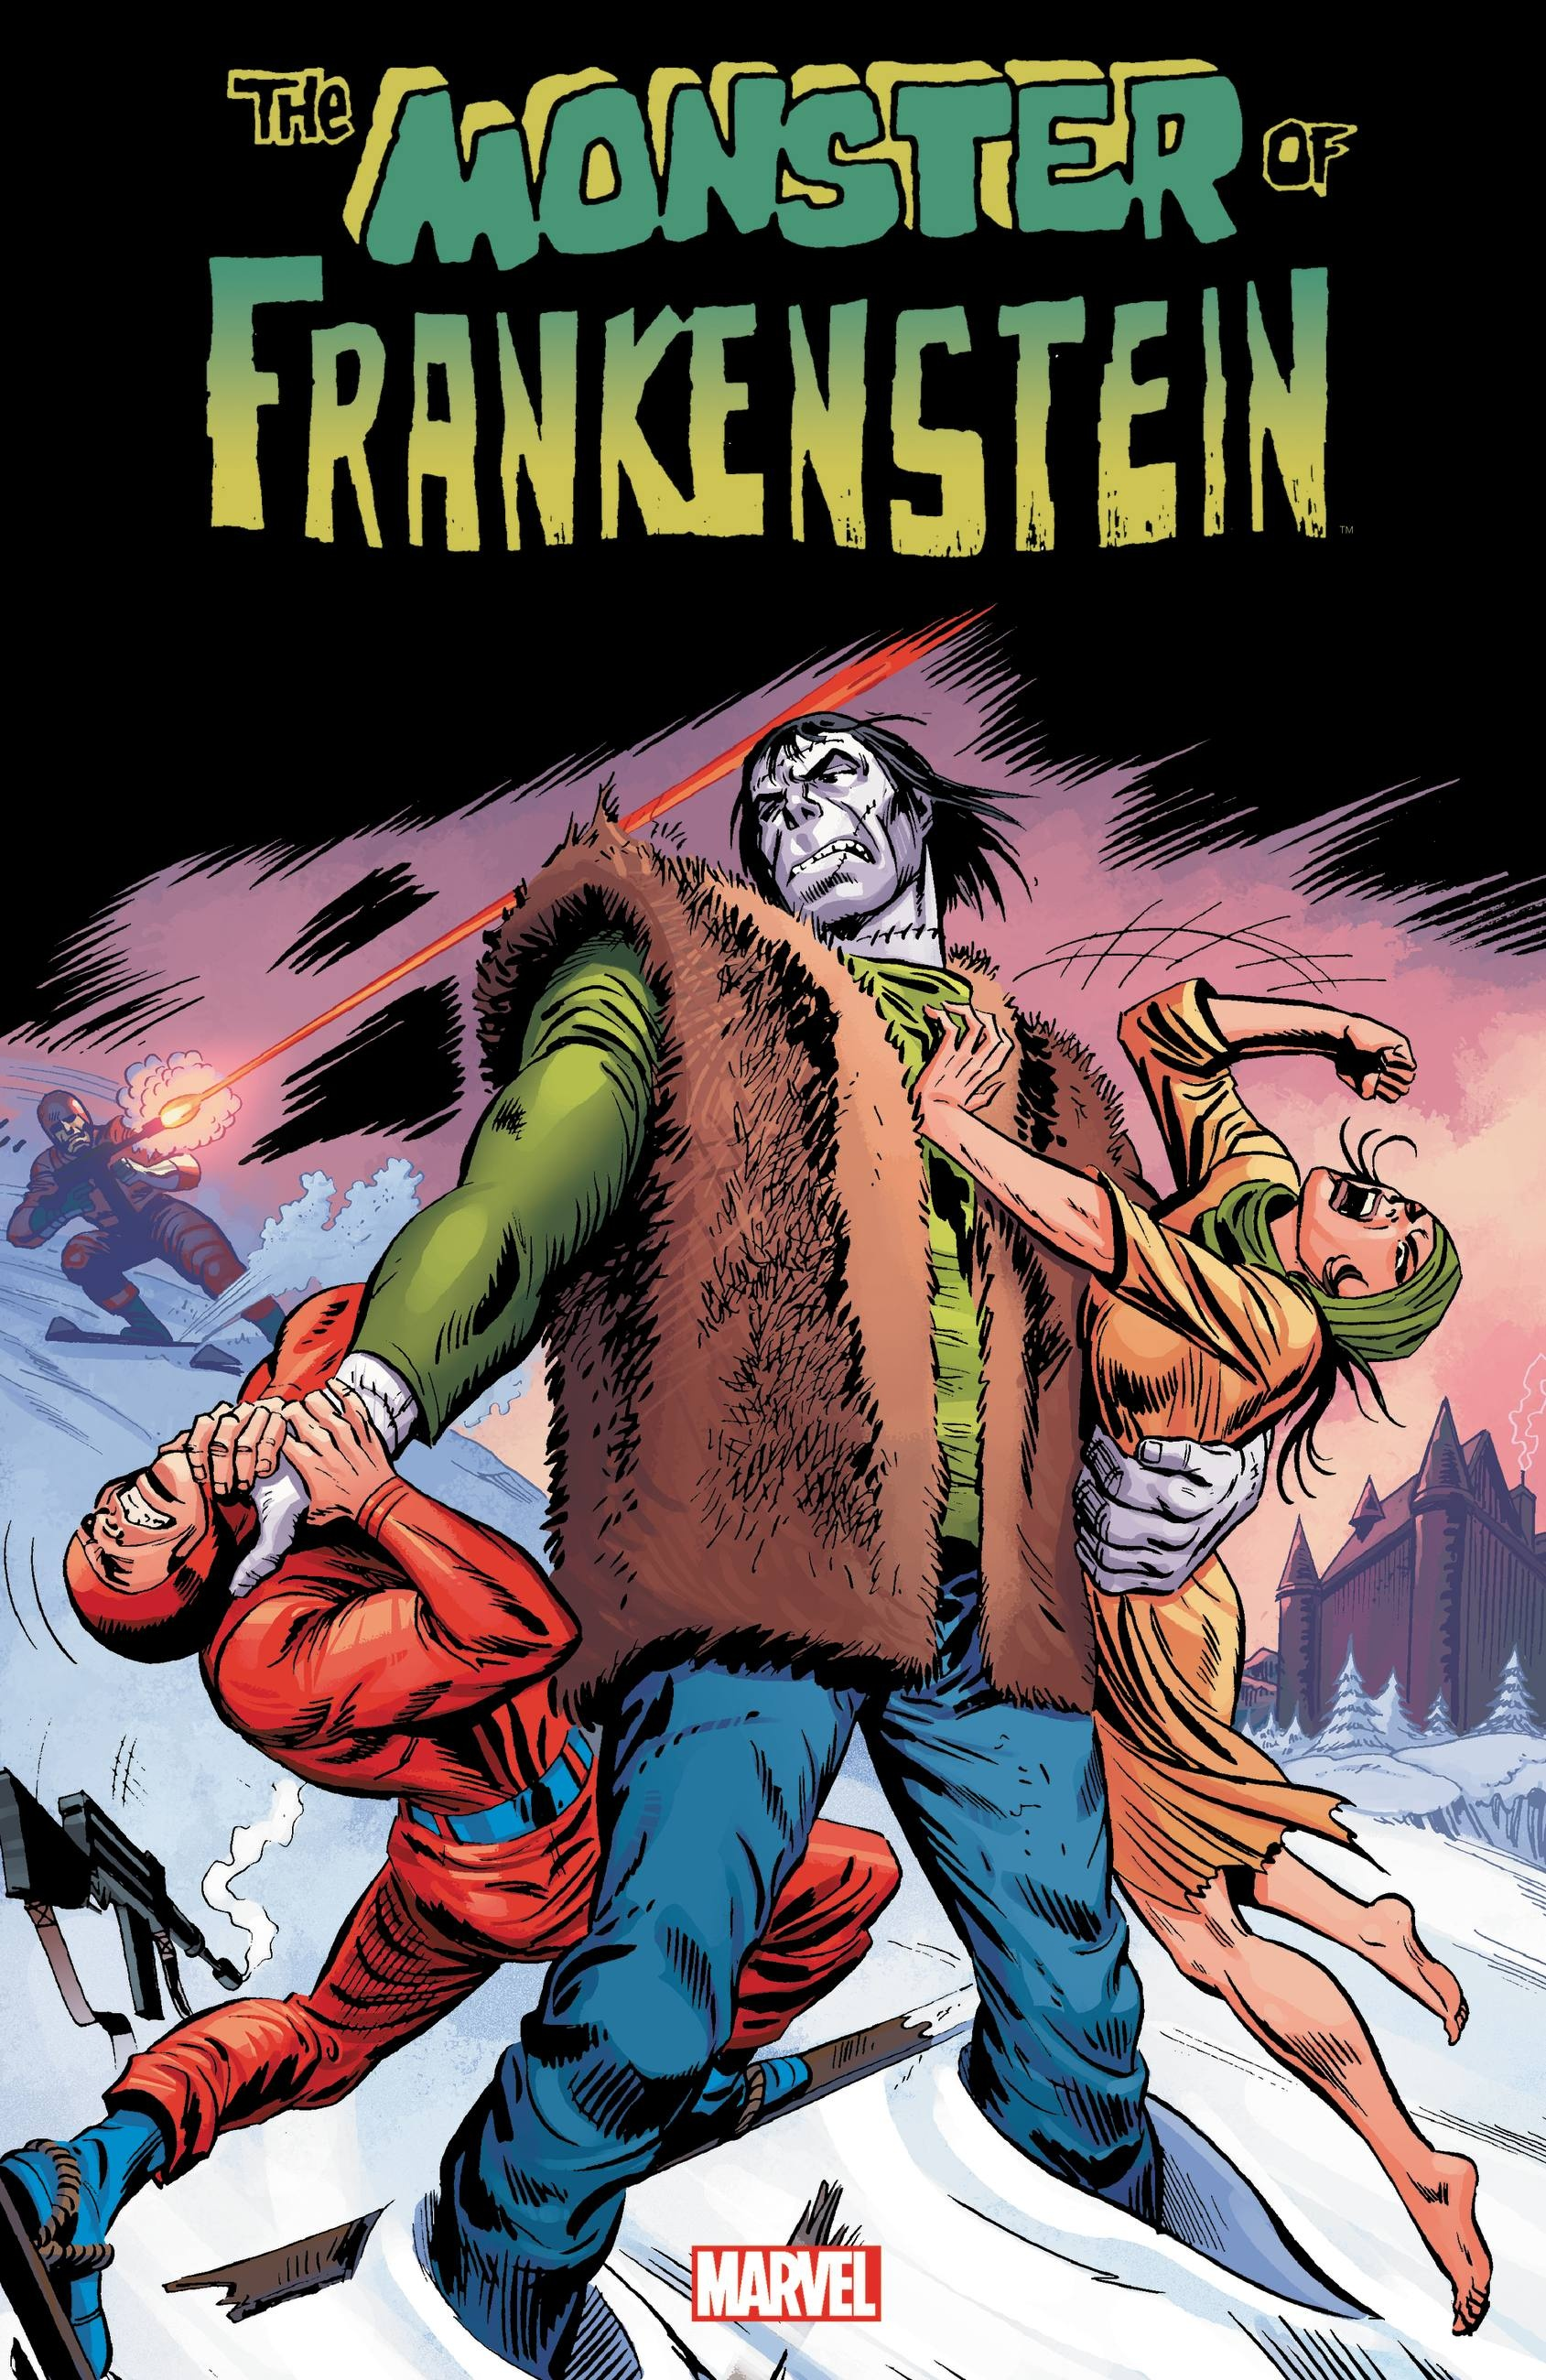 Monster of Frankenstein Vol. 1 inhuman vol 1